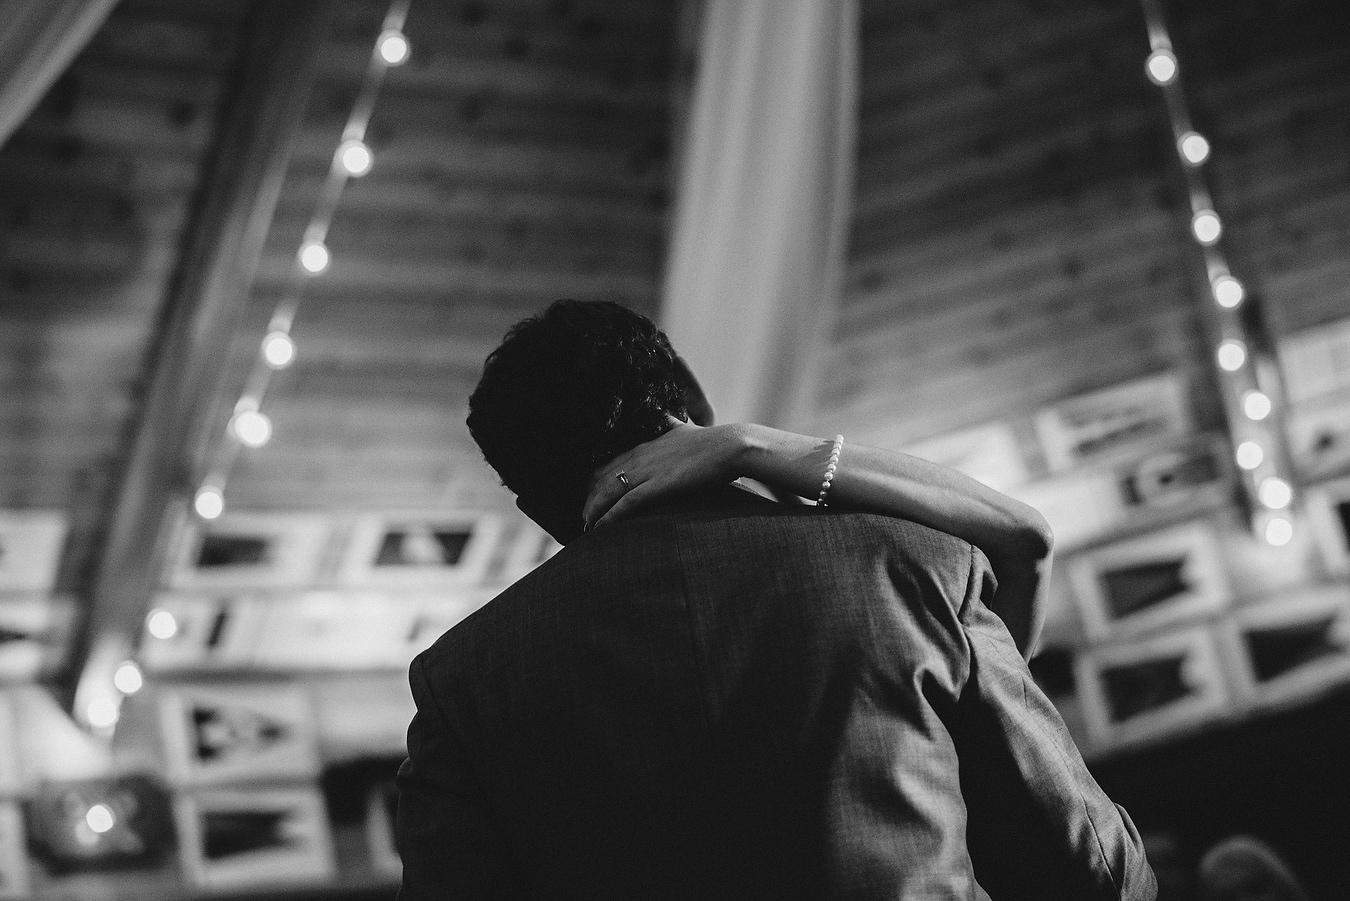 eastern_yacht_club_wedding_photos_marblehead_46.JPG